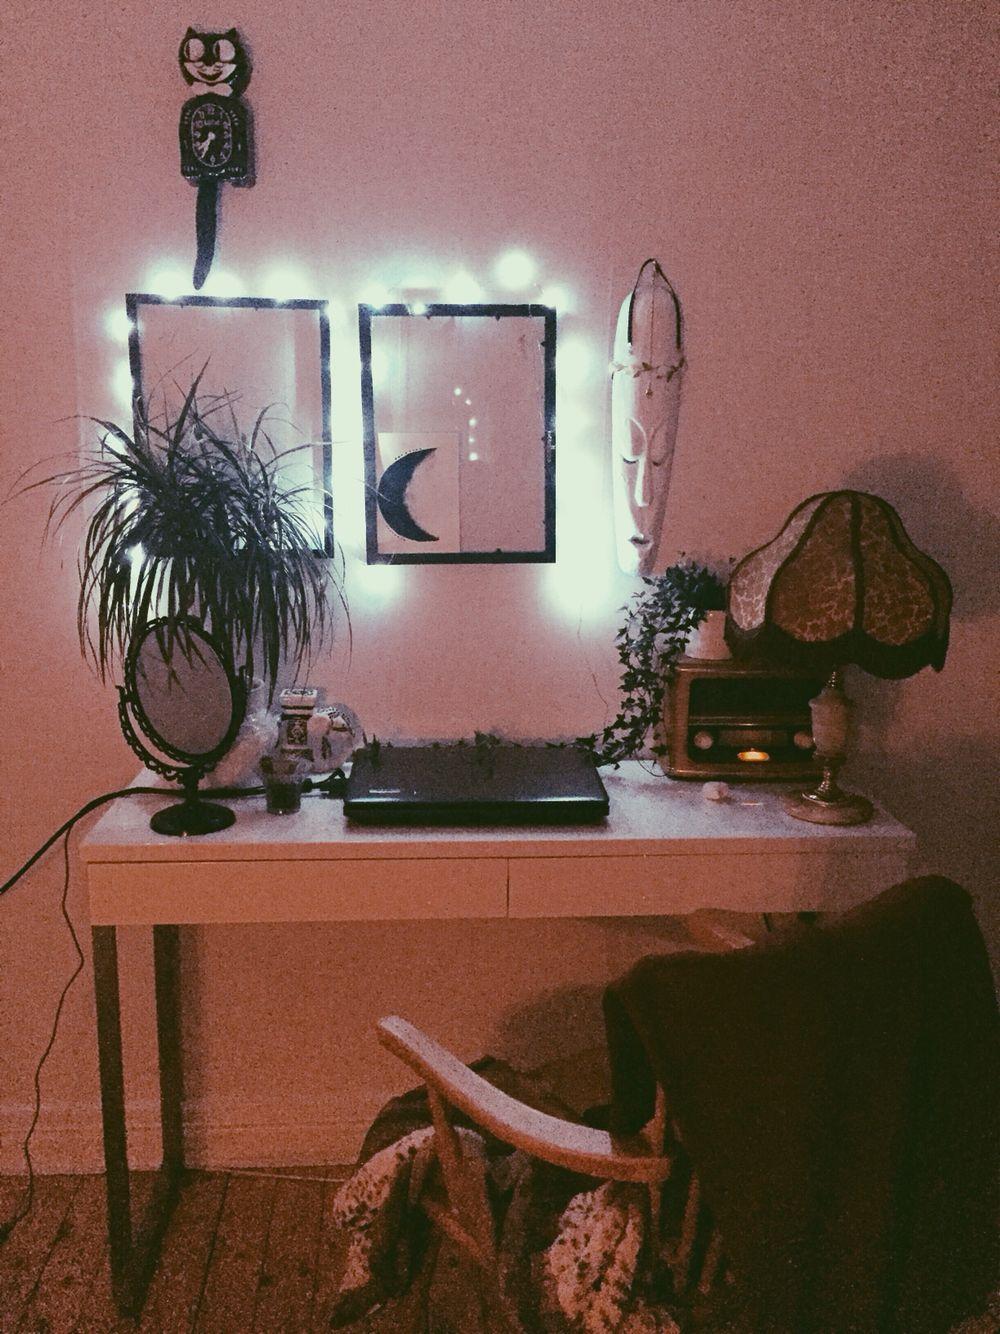 Grunge Aesthetic Bedroom Ideas